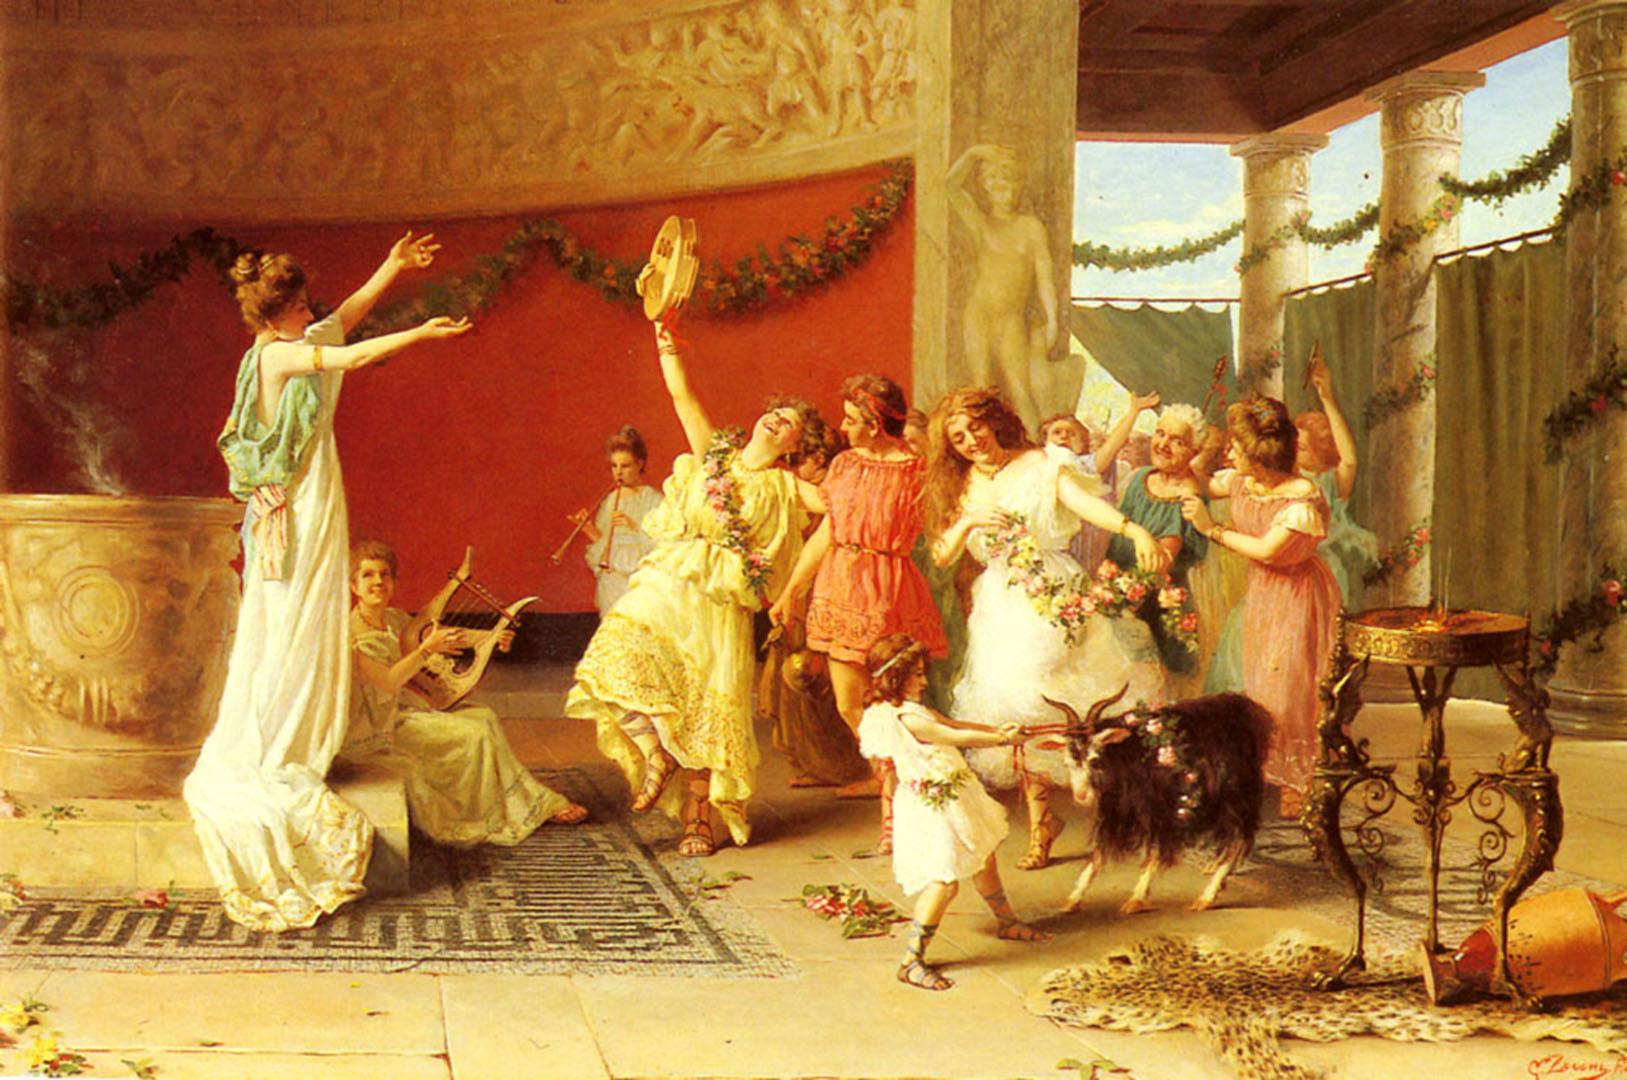 a-roman-dance-%C3%971080-wallpaper-wp3602113